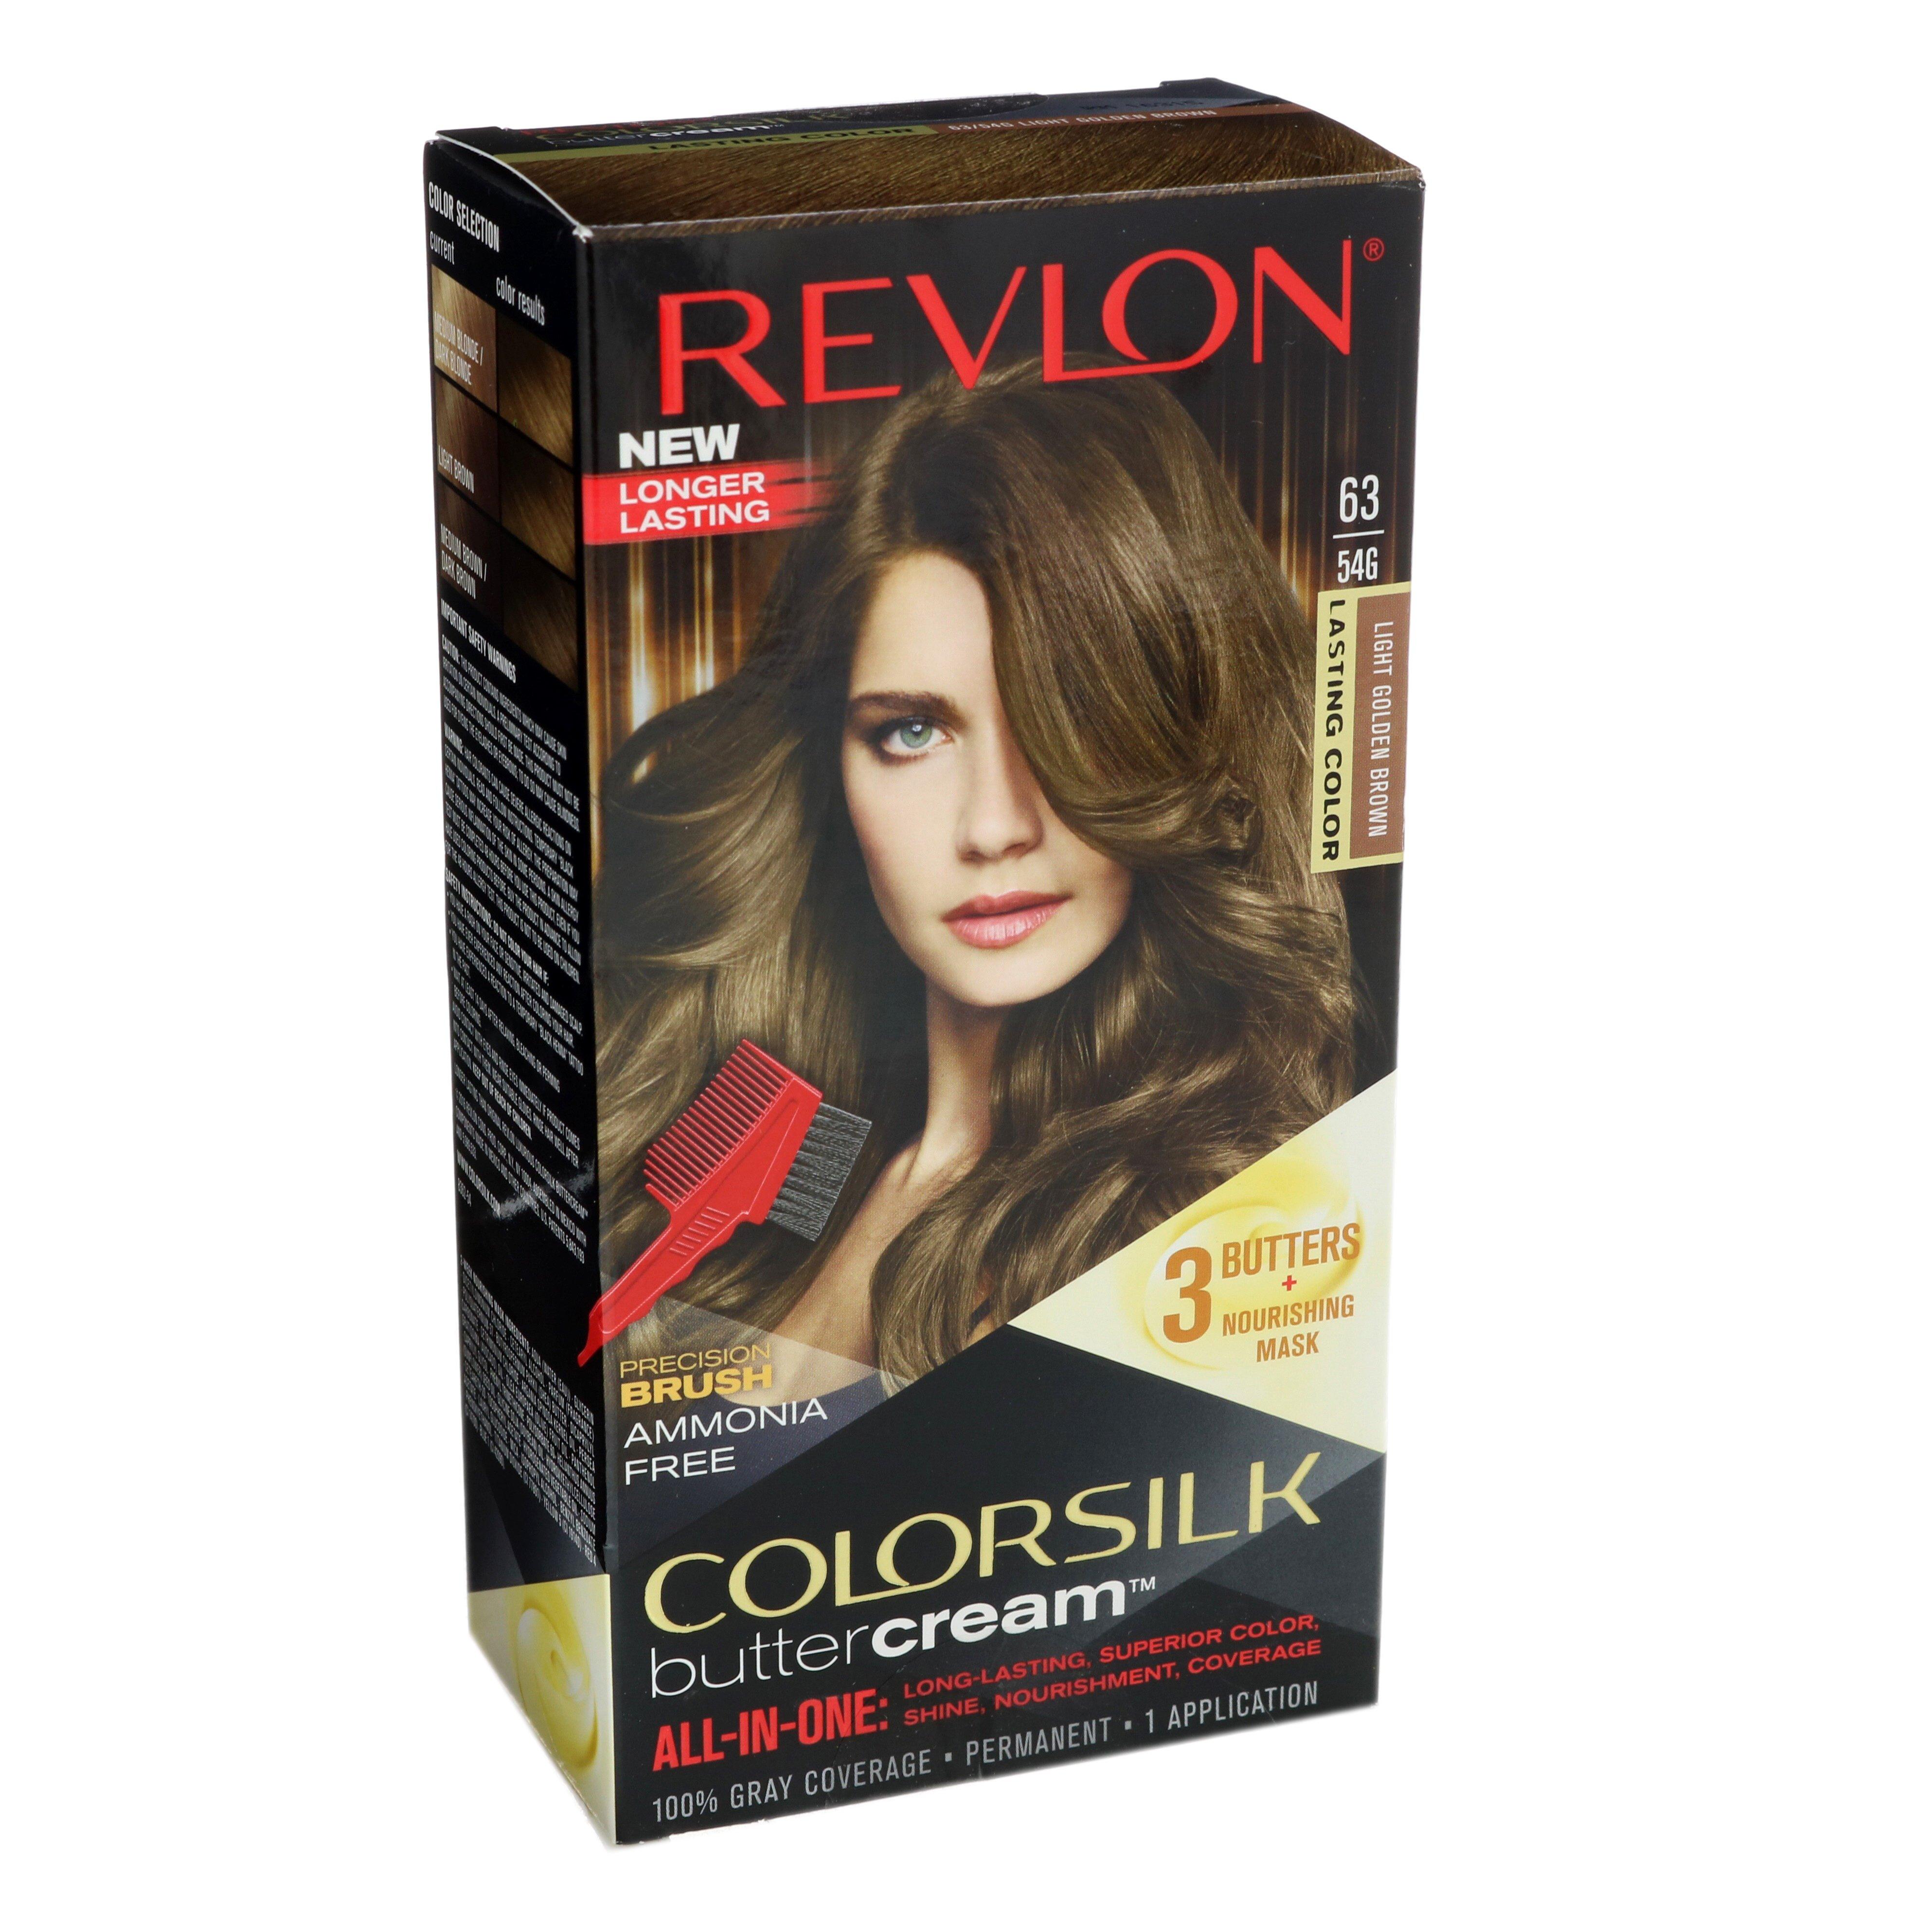 Revlon Colorsilk Buttercream Light Golden Brown 63 Shop Hair Color